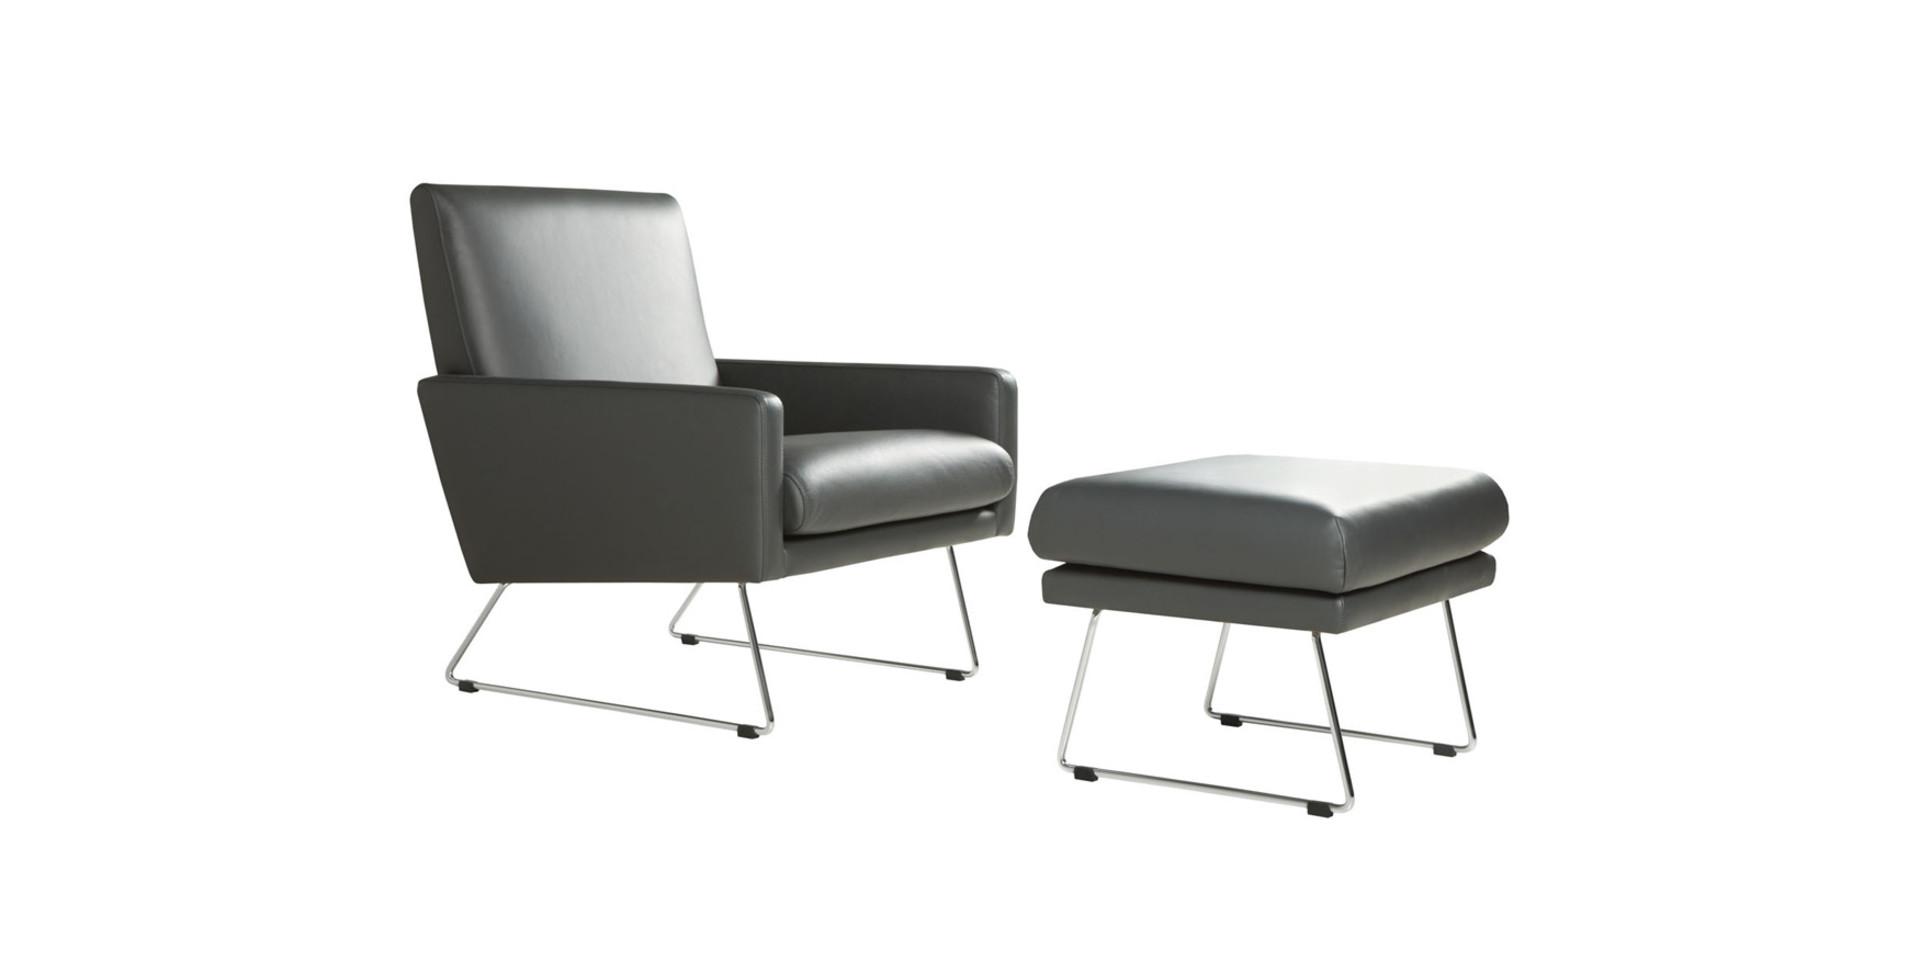 sits-max-fauteuil-footstool_oasi_dark_grey_3